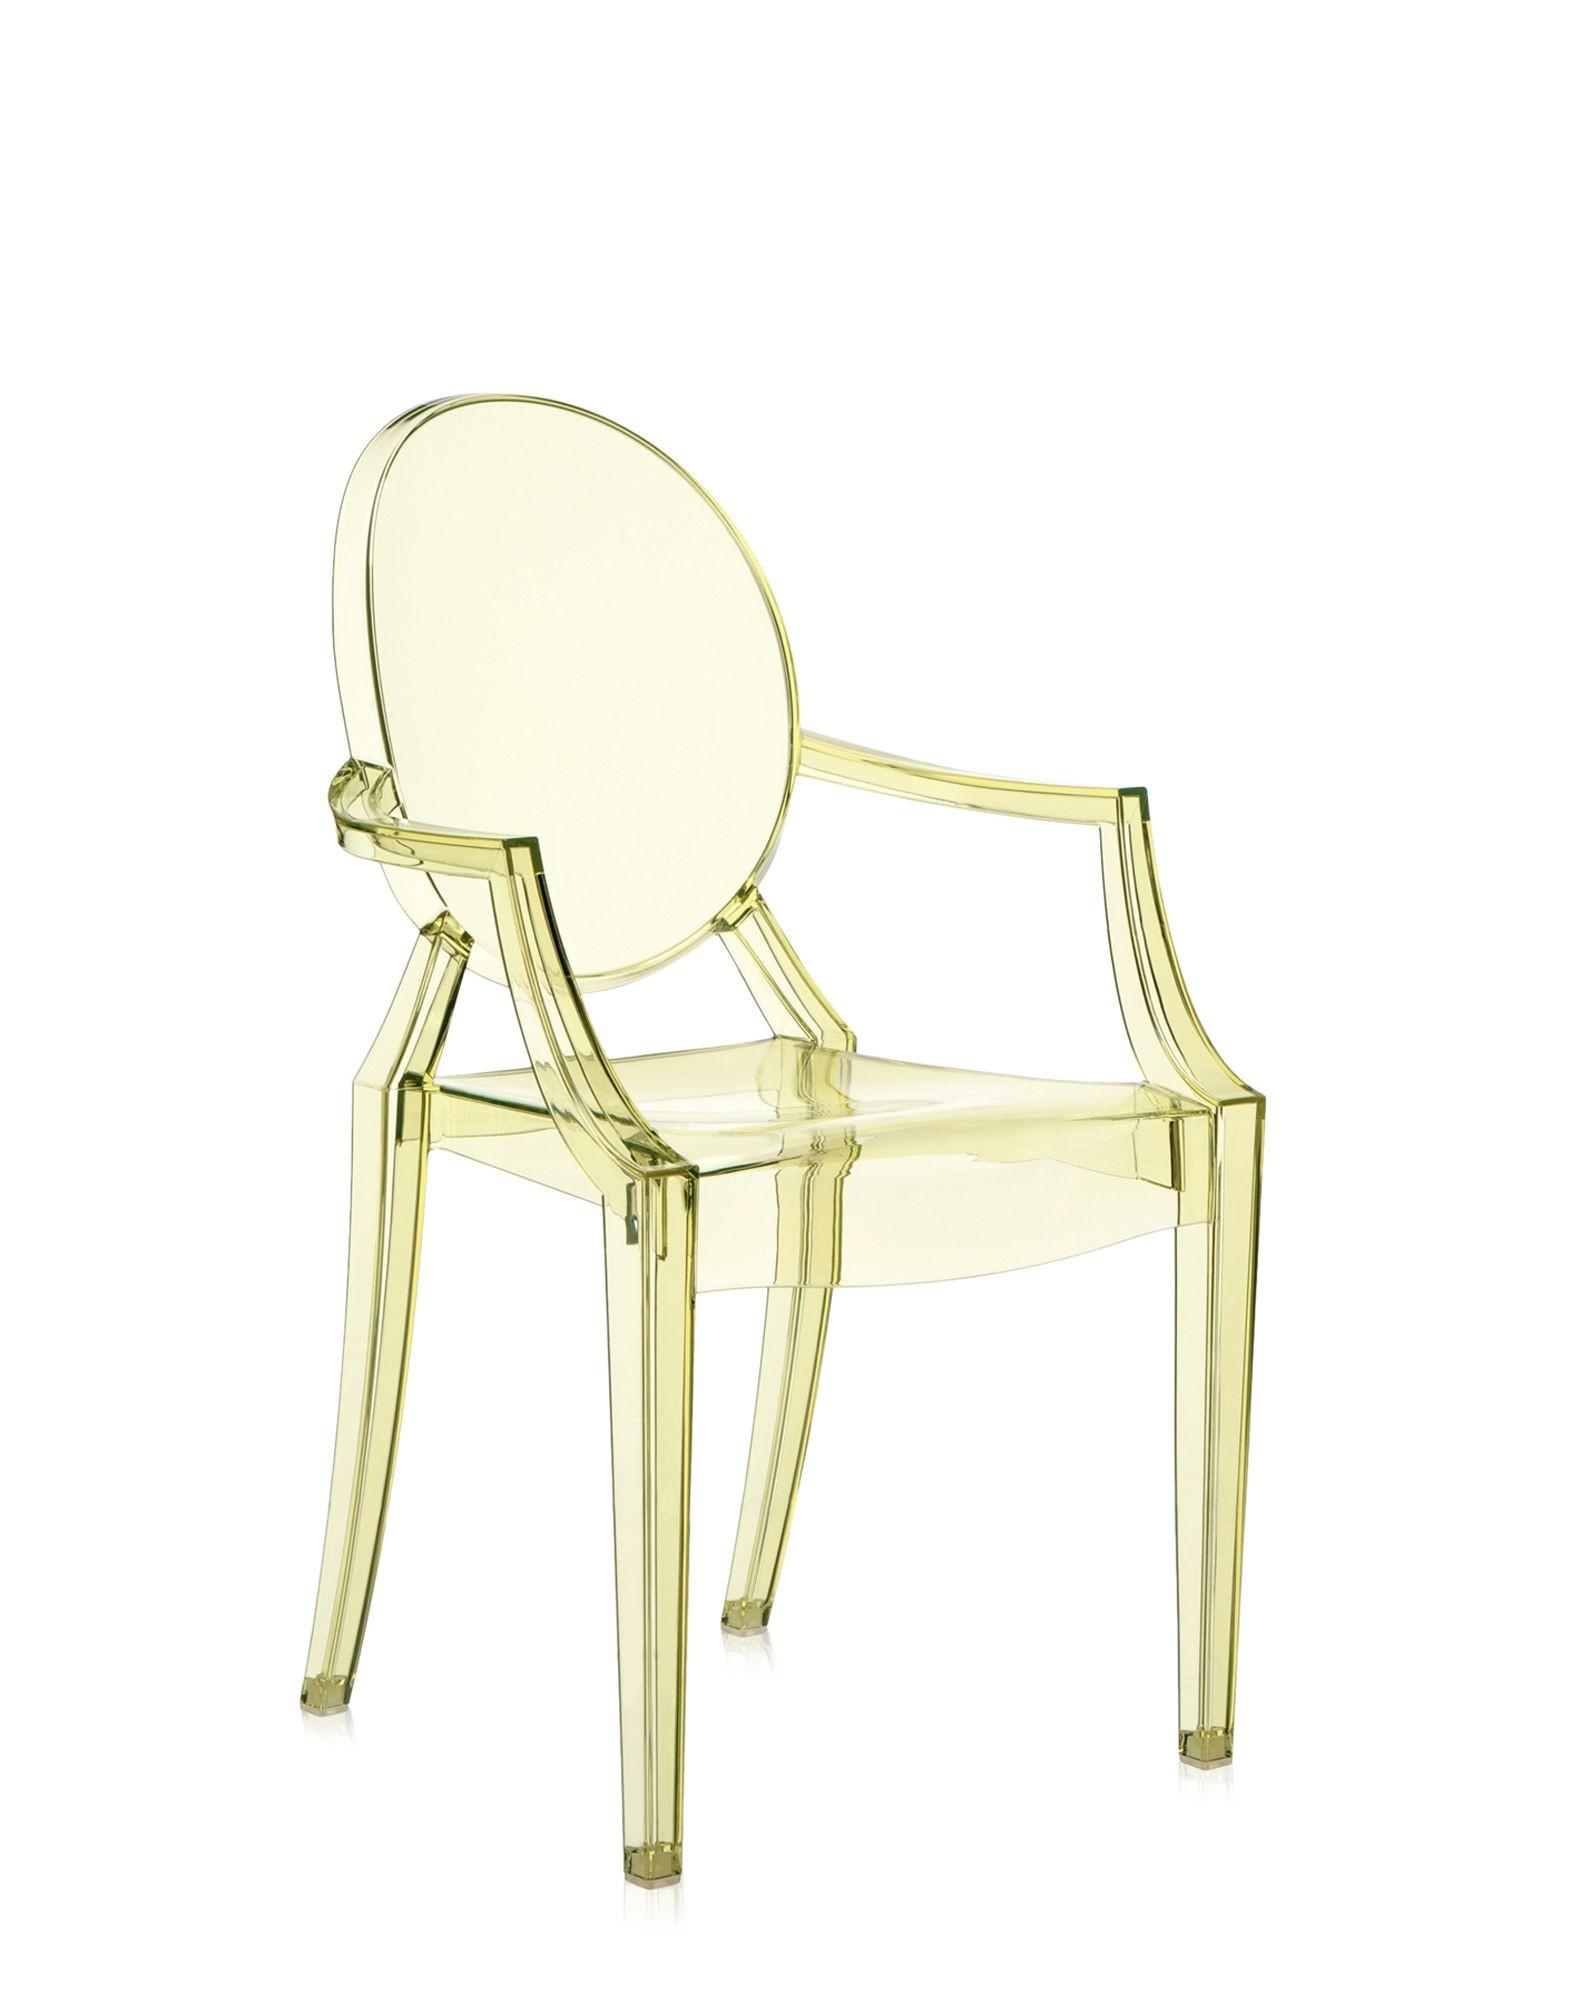 Fauteuil Louis Ghost De Philippe Starck fauteuil louis ghost de kartell, jaune